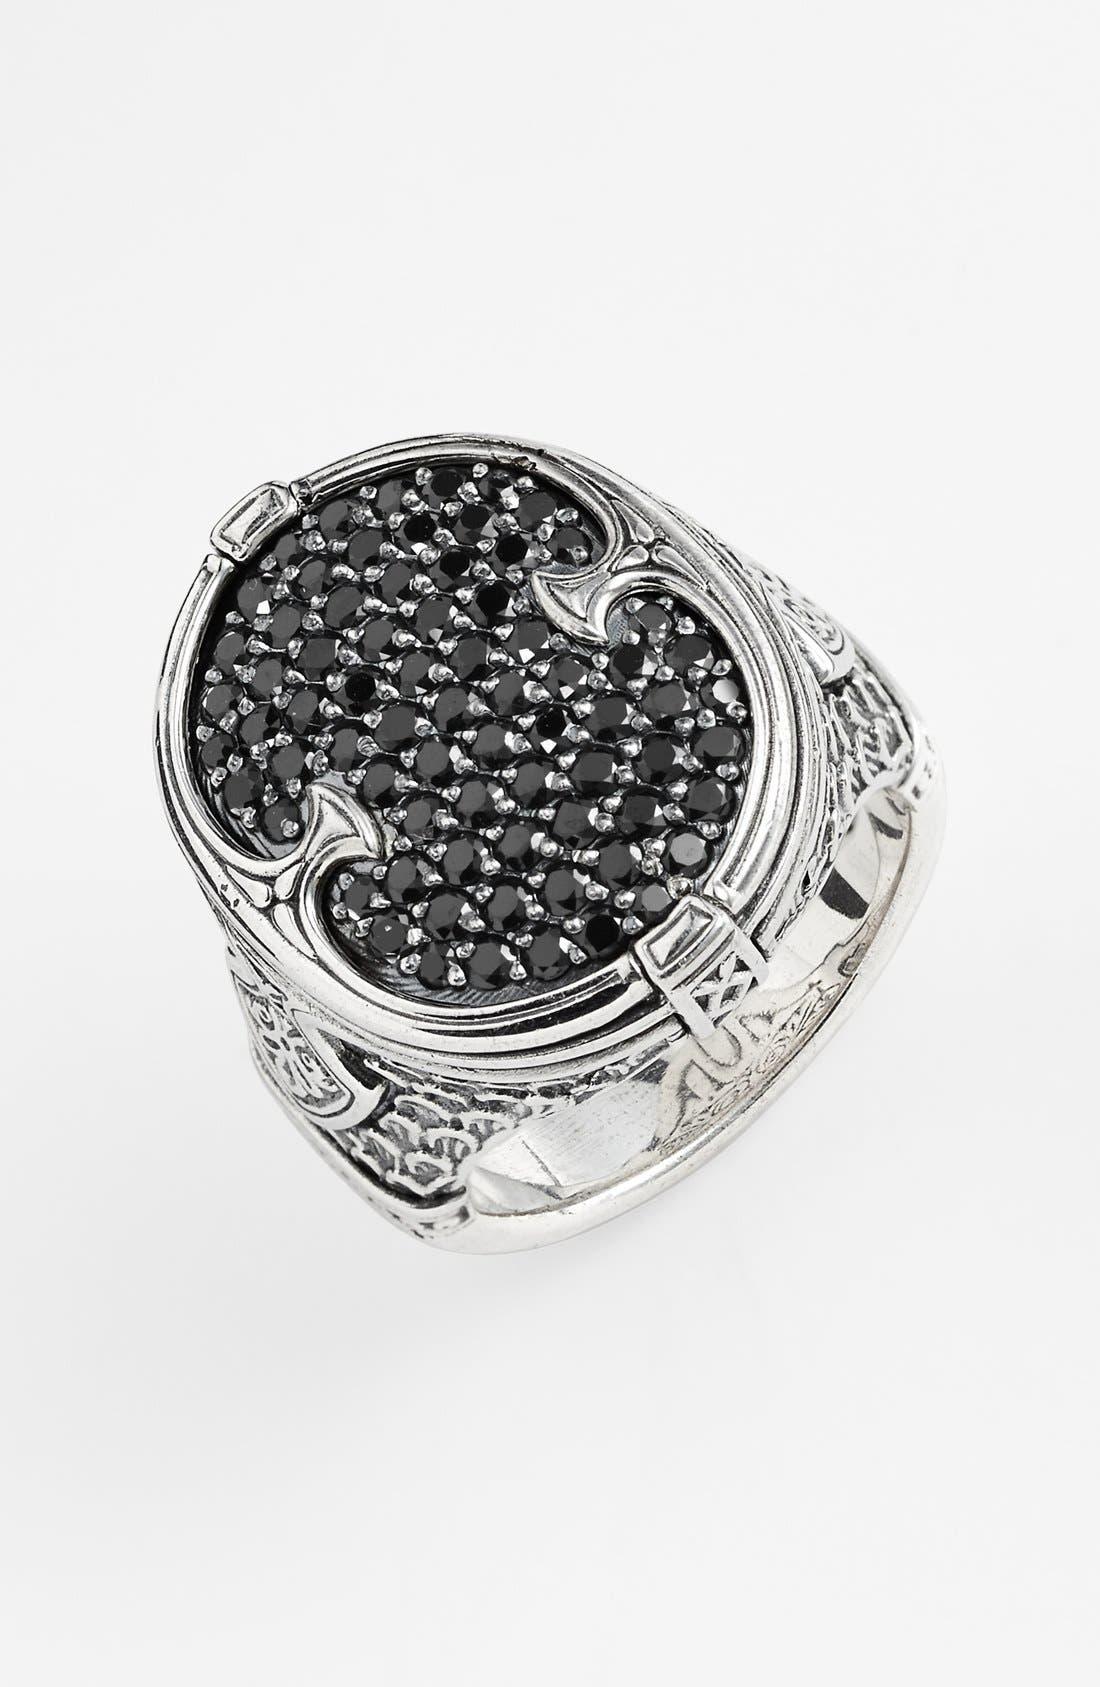 Konstantino 'Plato' Pavé Etched Ring